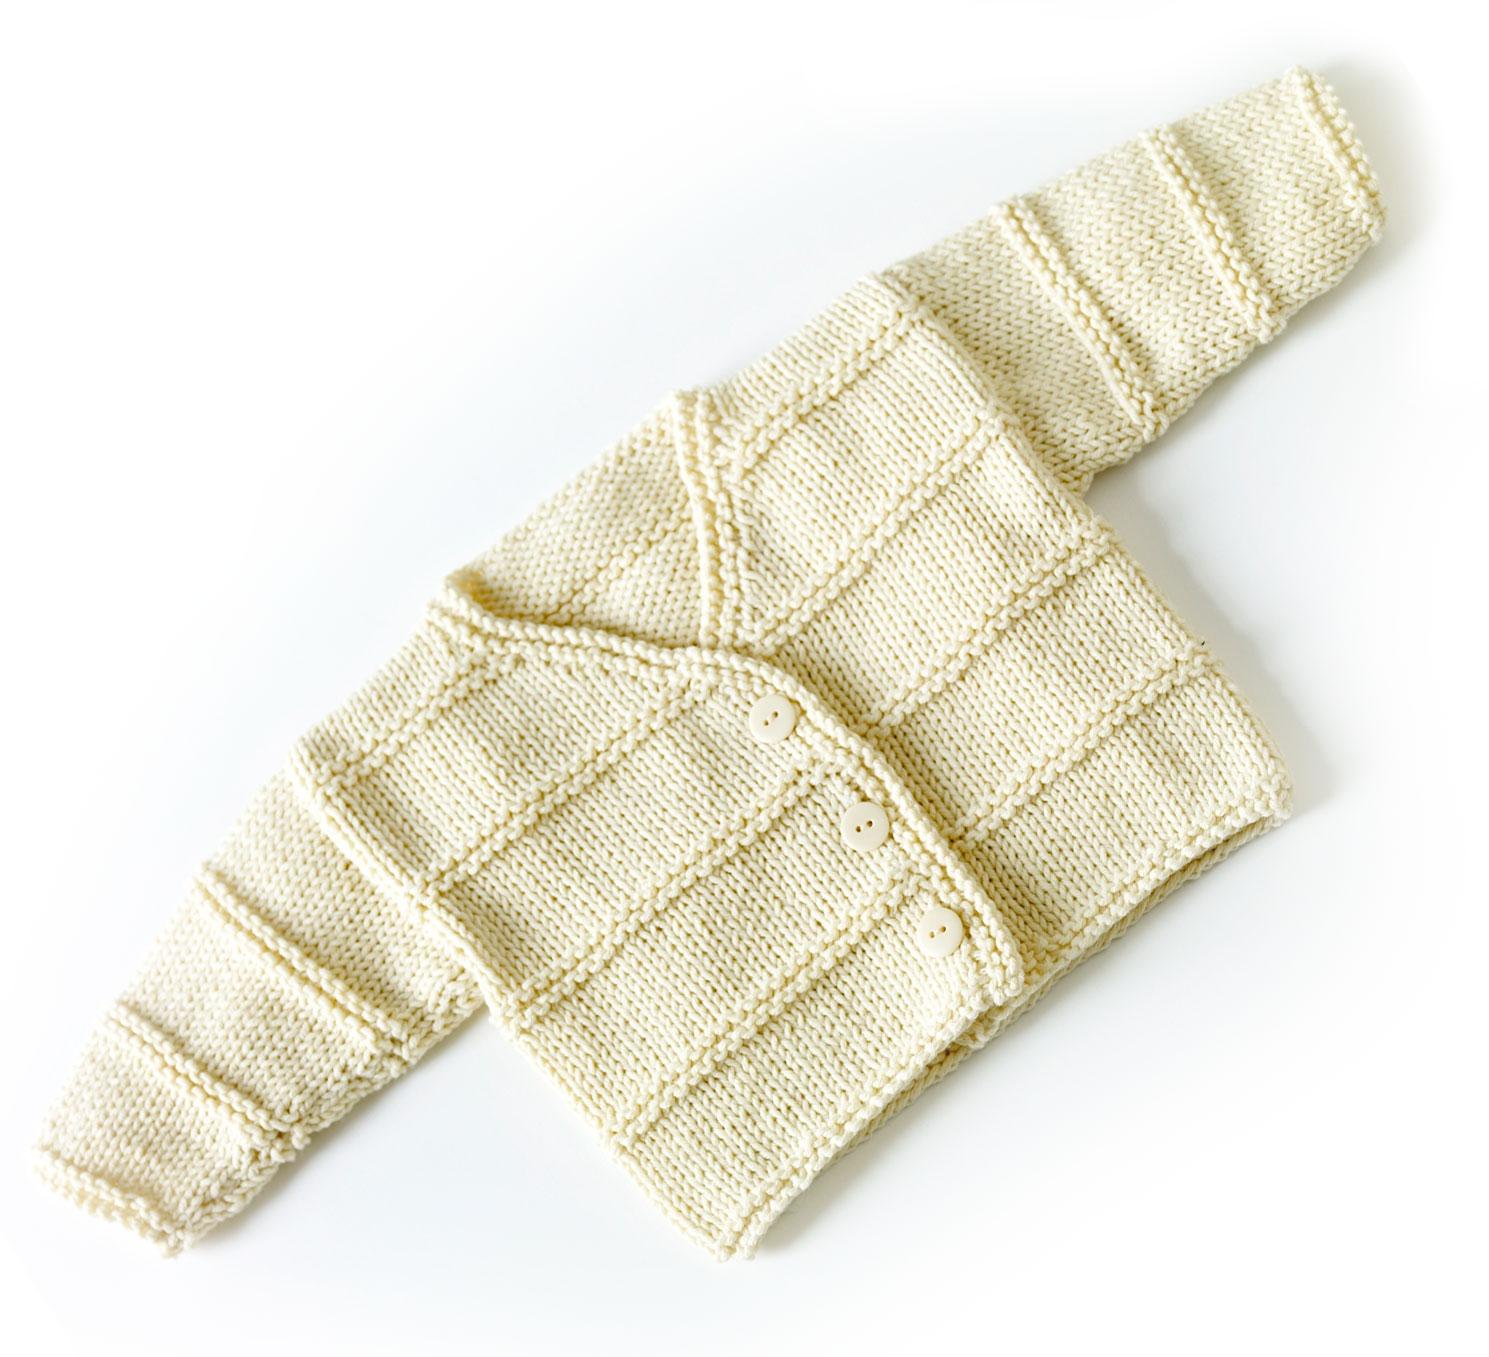 Knitting Pattern All In One Baby Cardigan : Ana Maria tricoecrochebebe -: Casaquinhos em trico